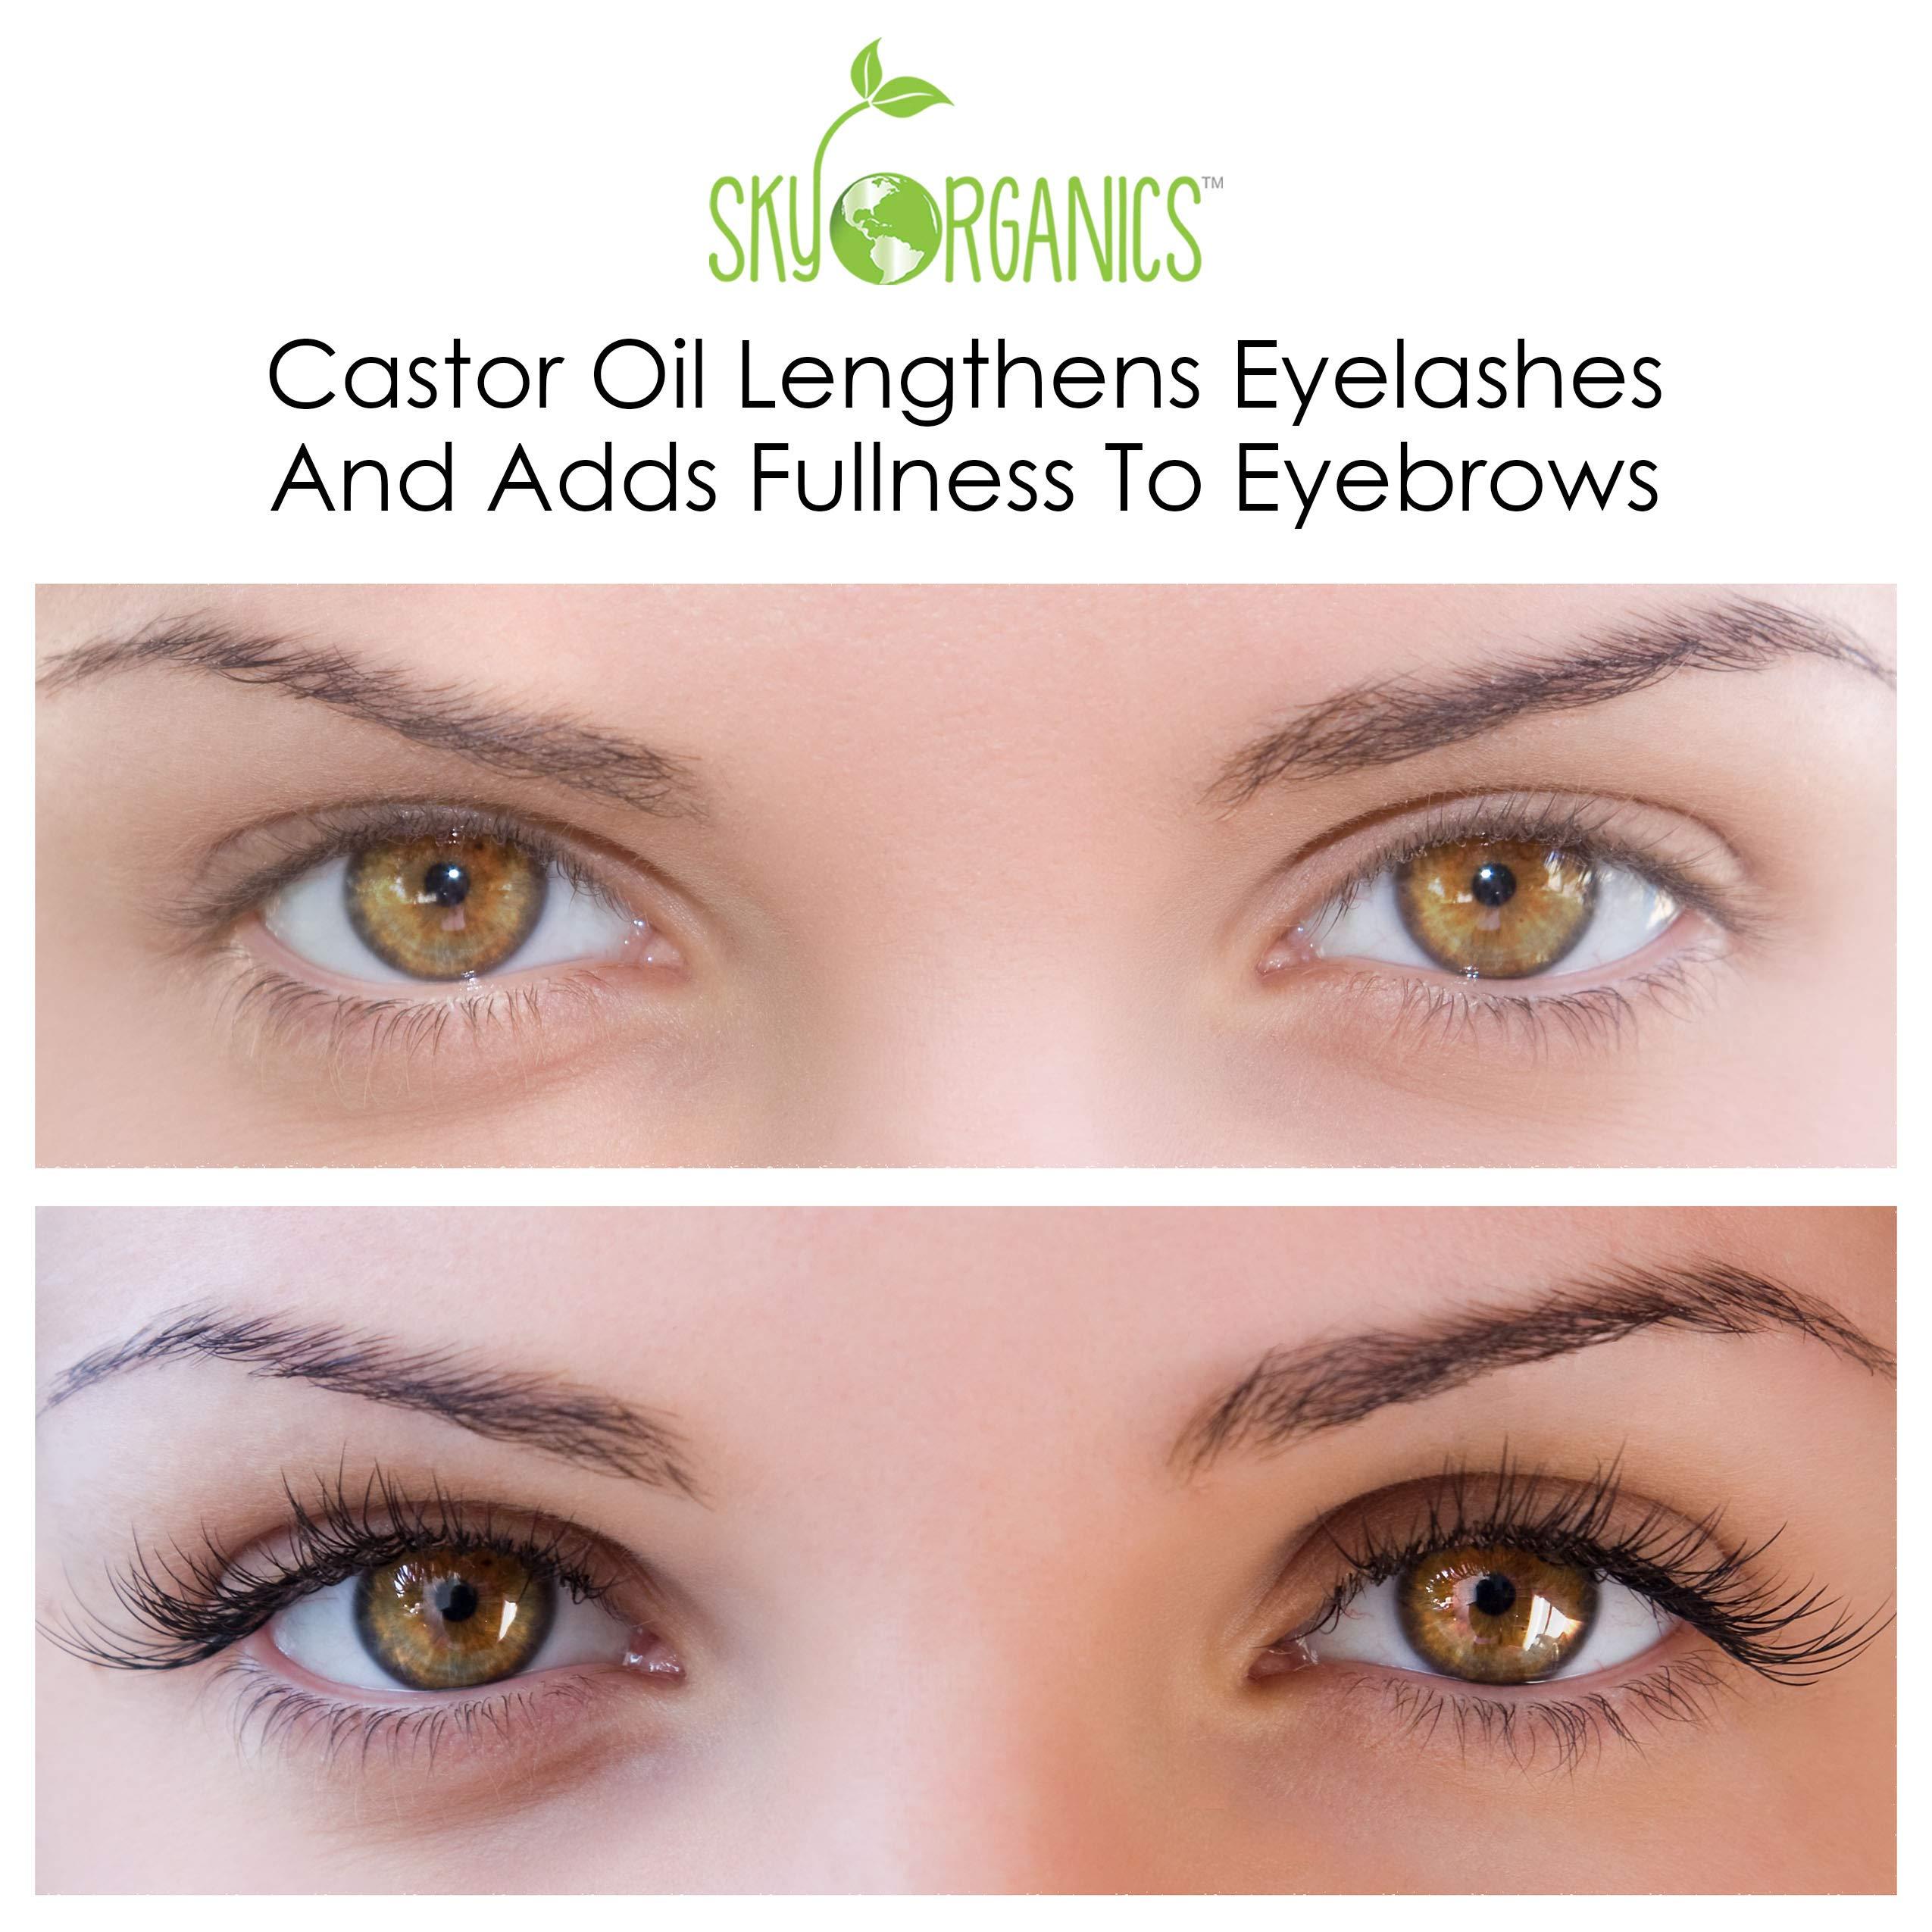 Castor Oil (16oz) USDA Organic Cold-Pressed, 100% Pure, Hexane-Free Castor Oil - Moisturizing & Healing, For Dry Skin, Hair Growth - For Skin, Hair Care, Eyelashes - Caster Oil By Sky Organics by Sky Organics (Image #4)